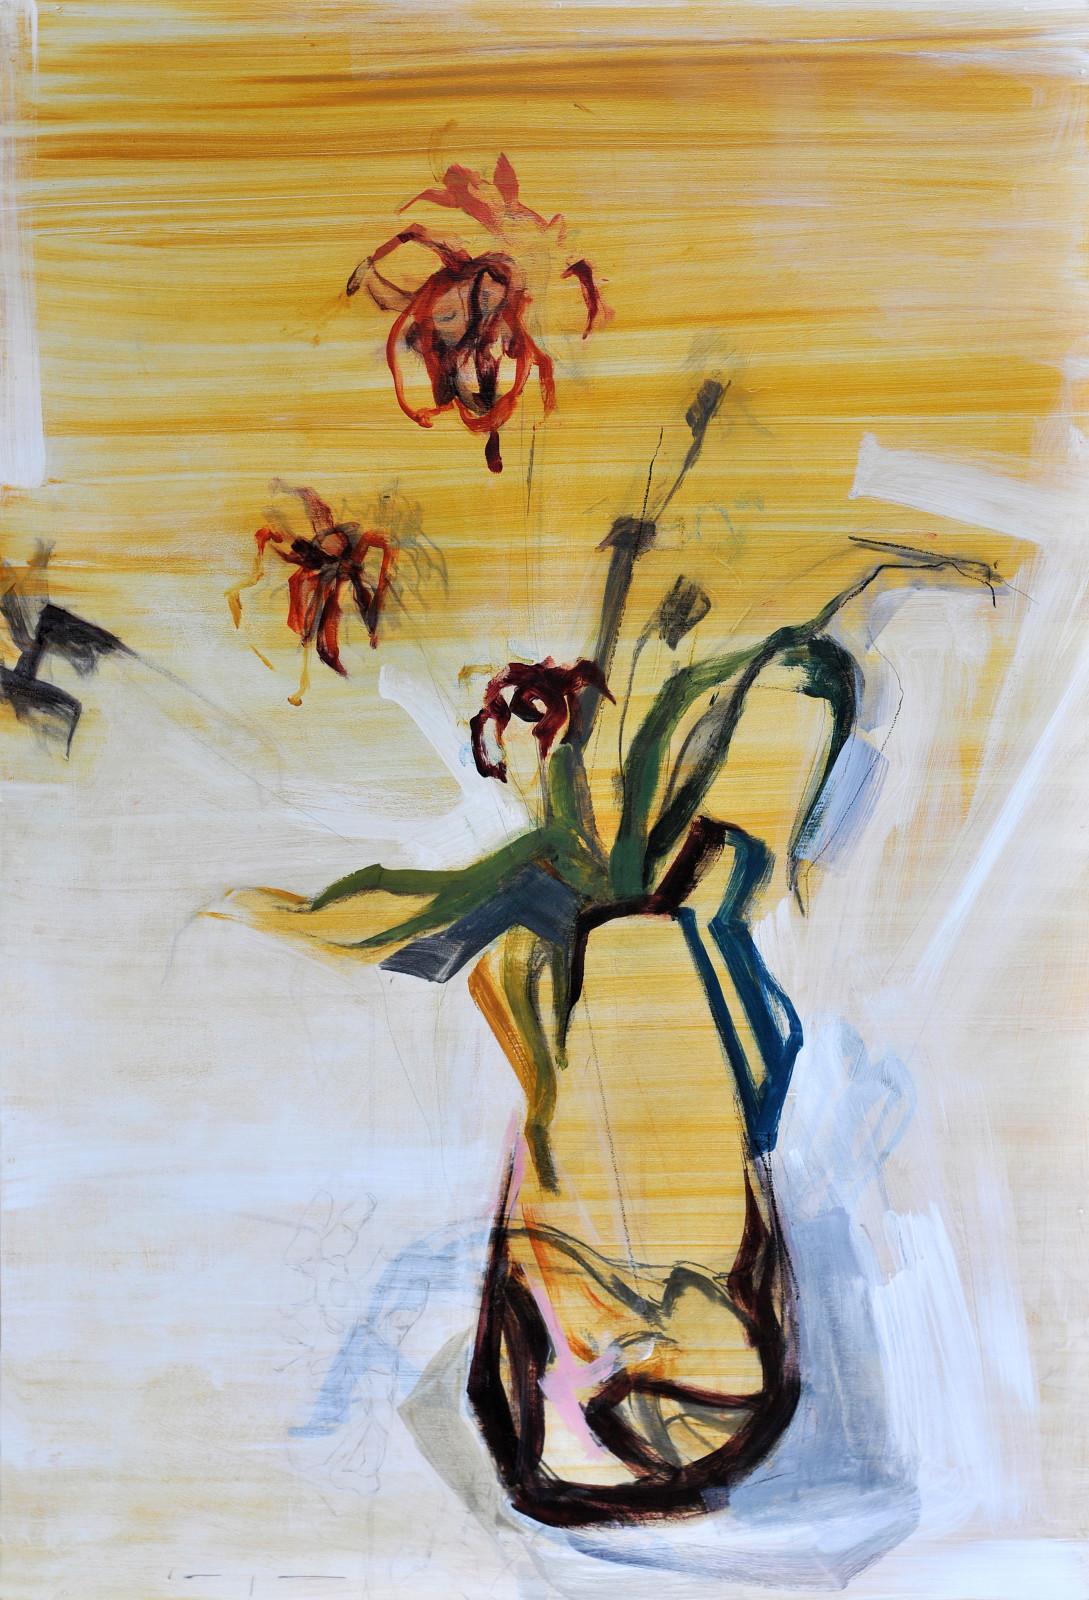 Flowers Vase and Hare | Original Artwork